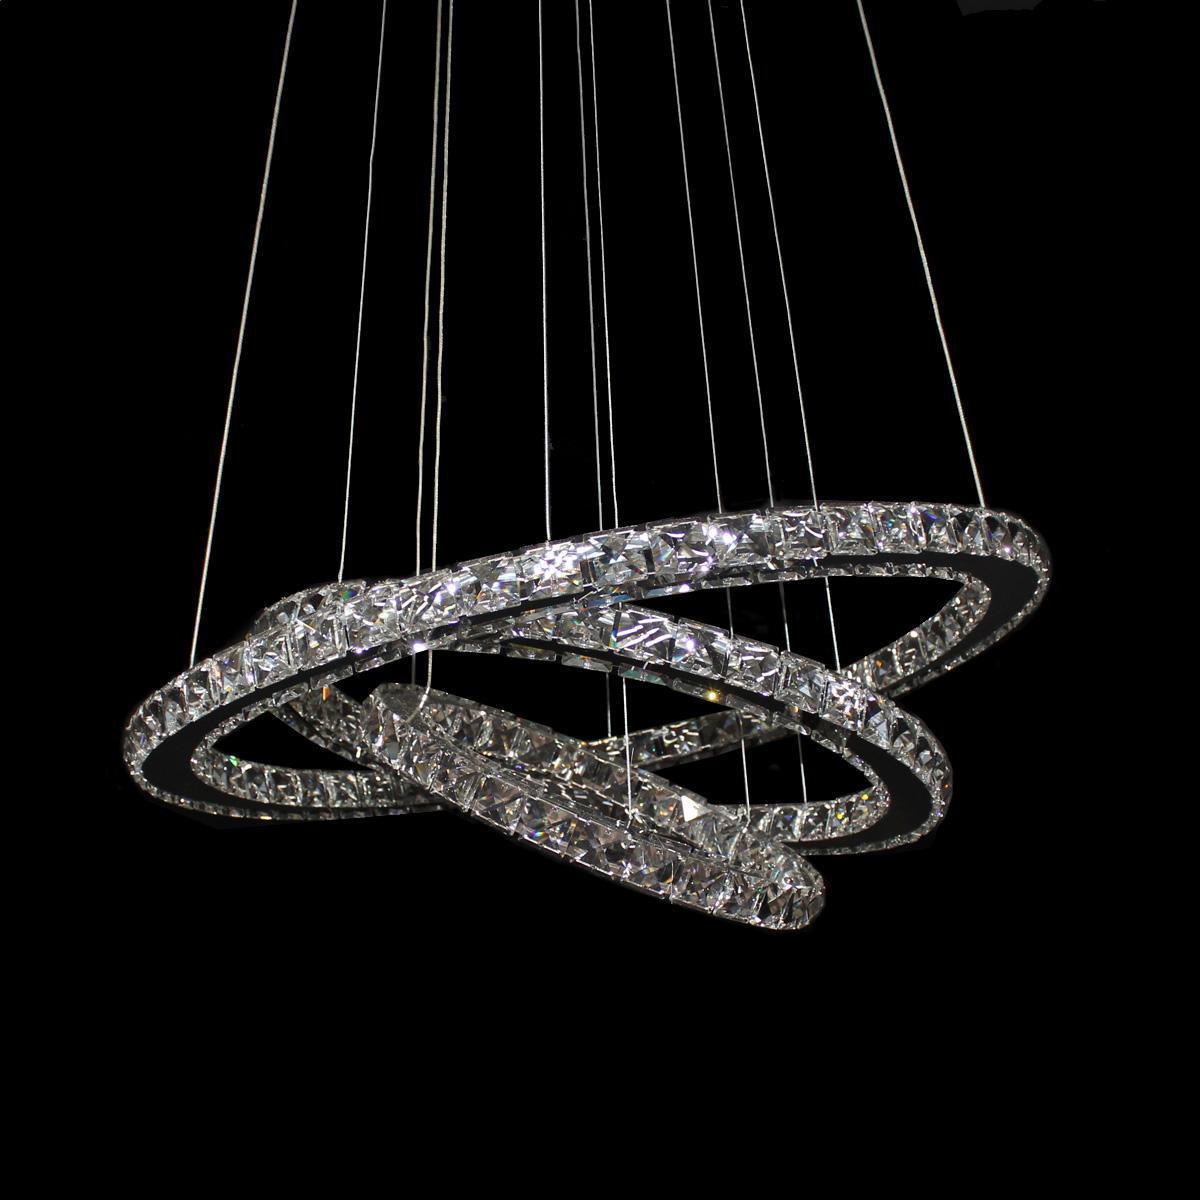 GALAXY 1000 LED Crystal Pendant - LEDP1028